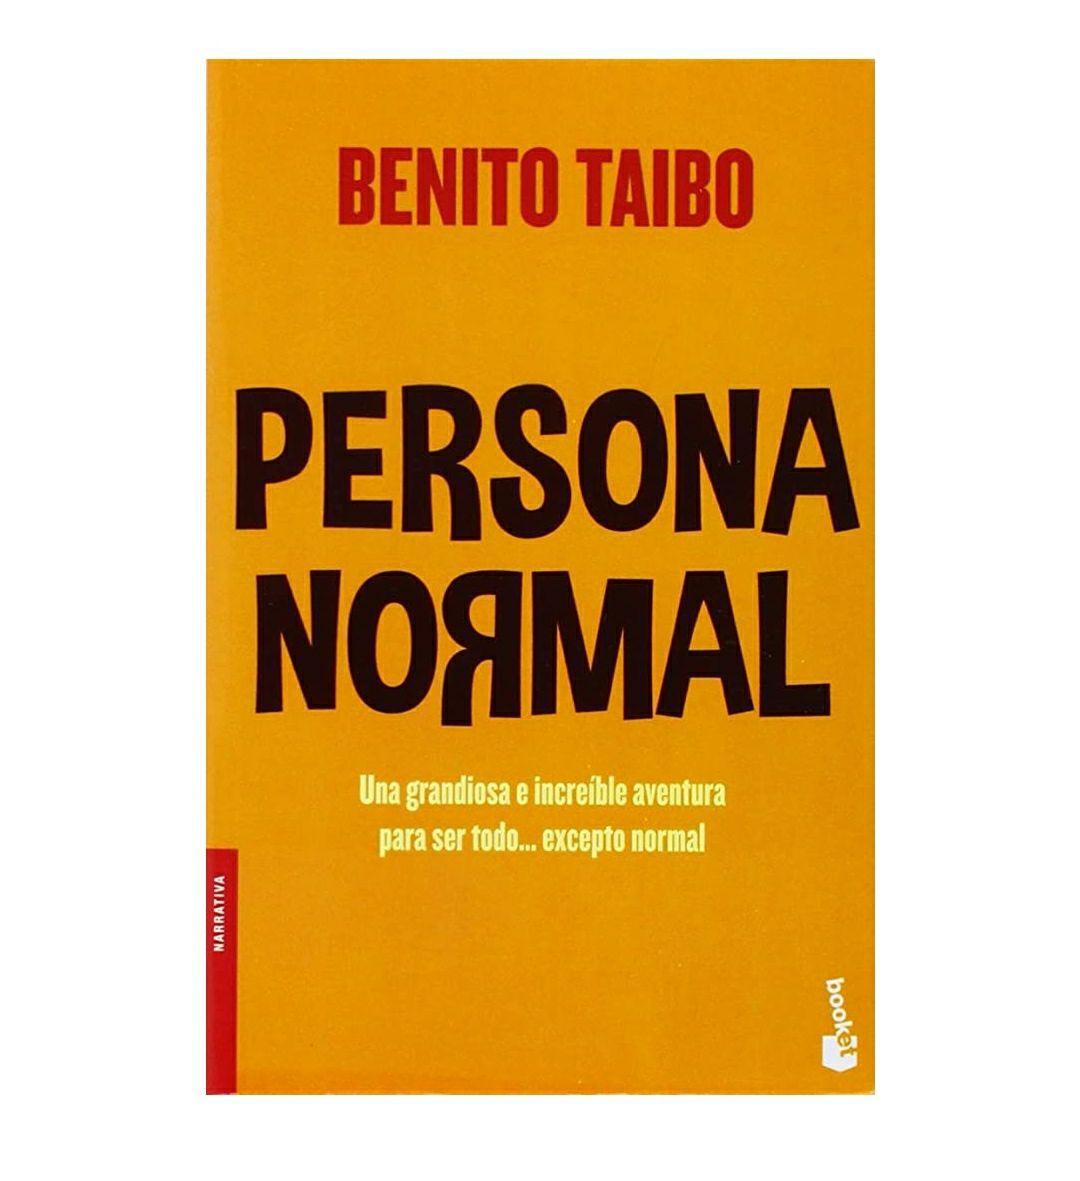 Amazon: Libro Persona Normal de Benito Taibo - Pasta blanda